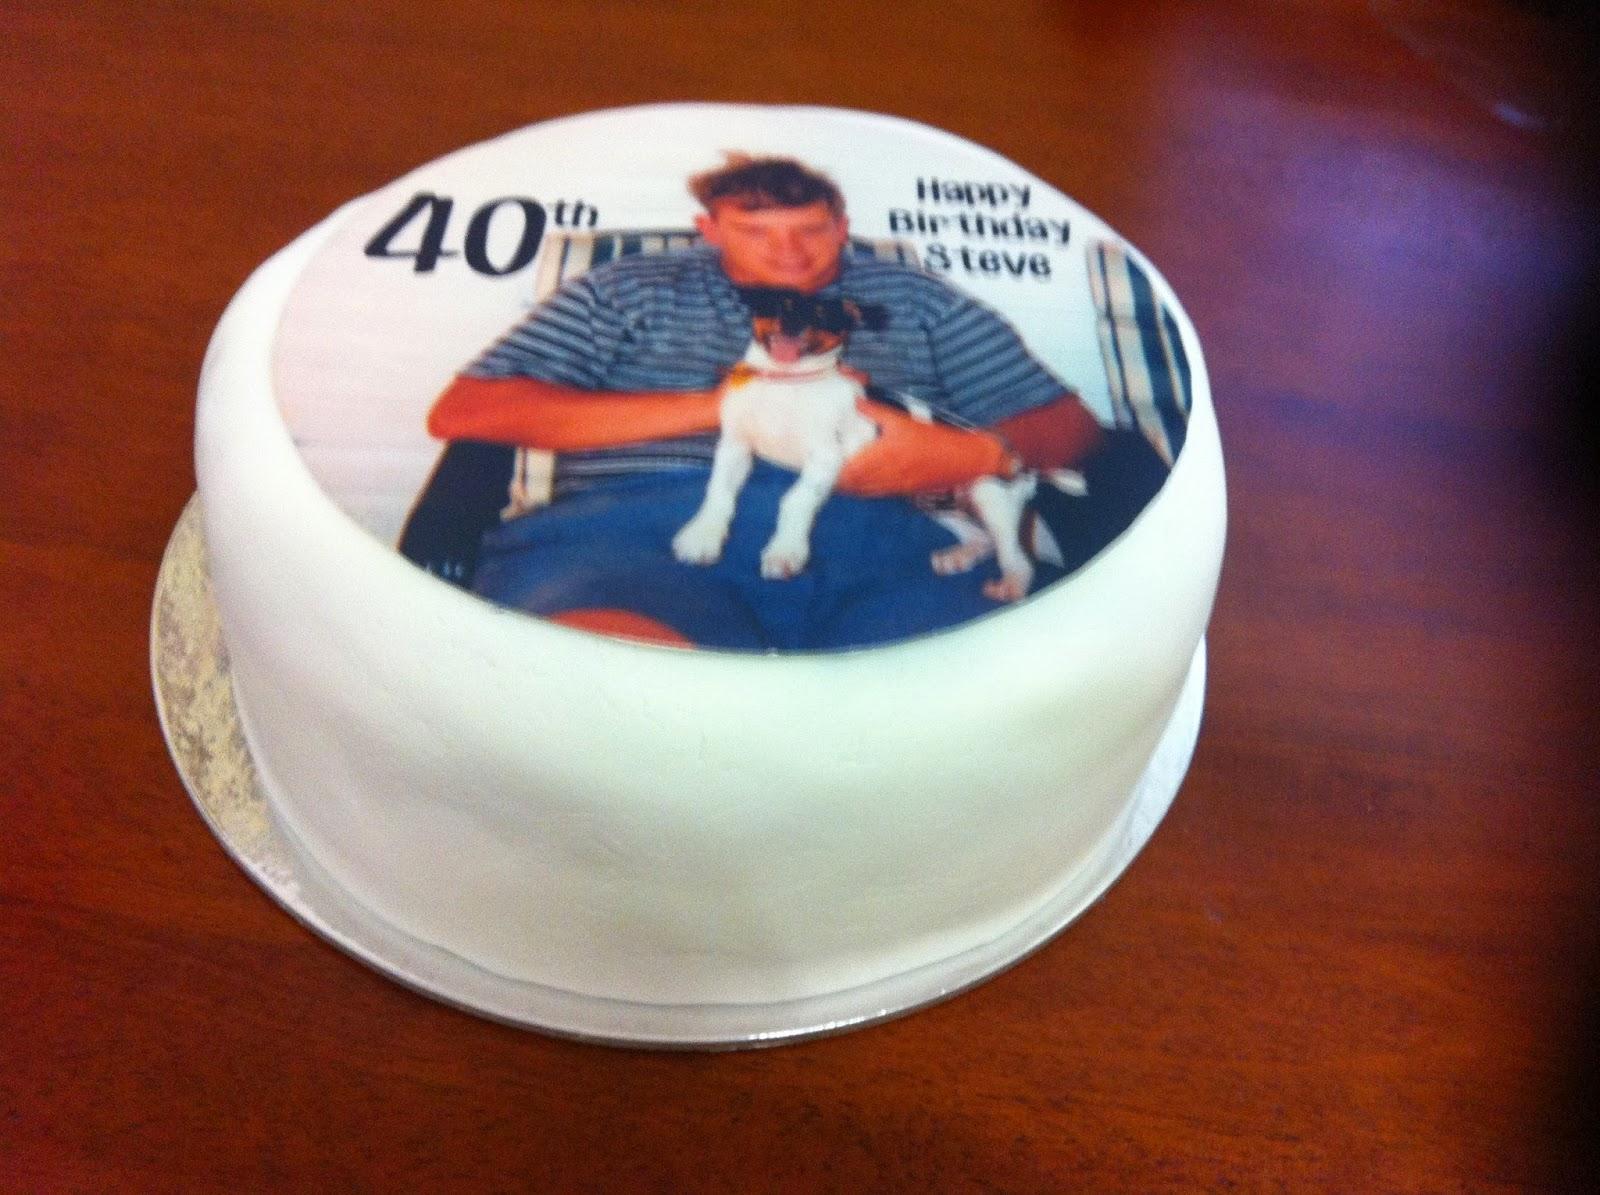 Happy 40th Birthday Steve